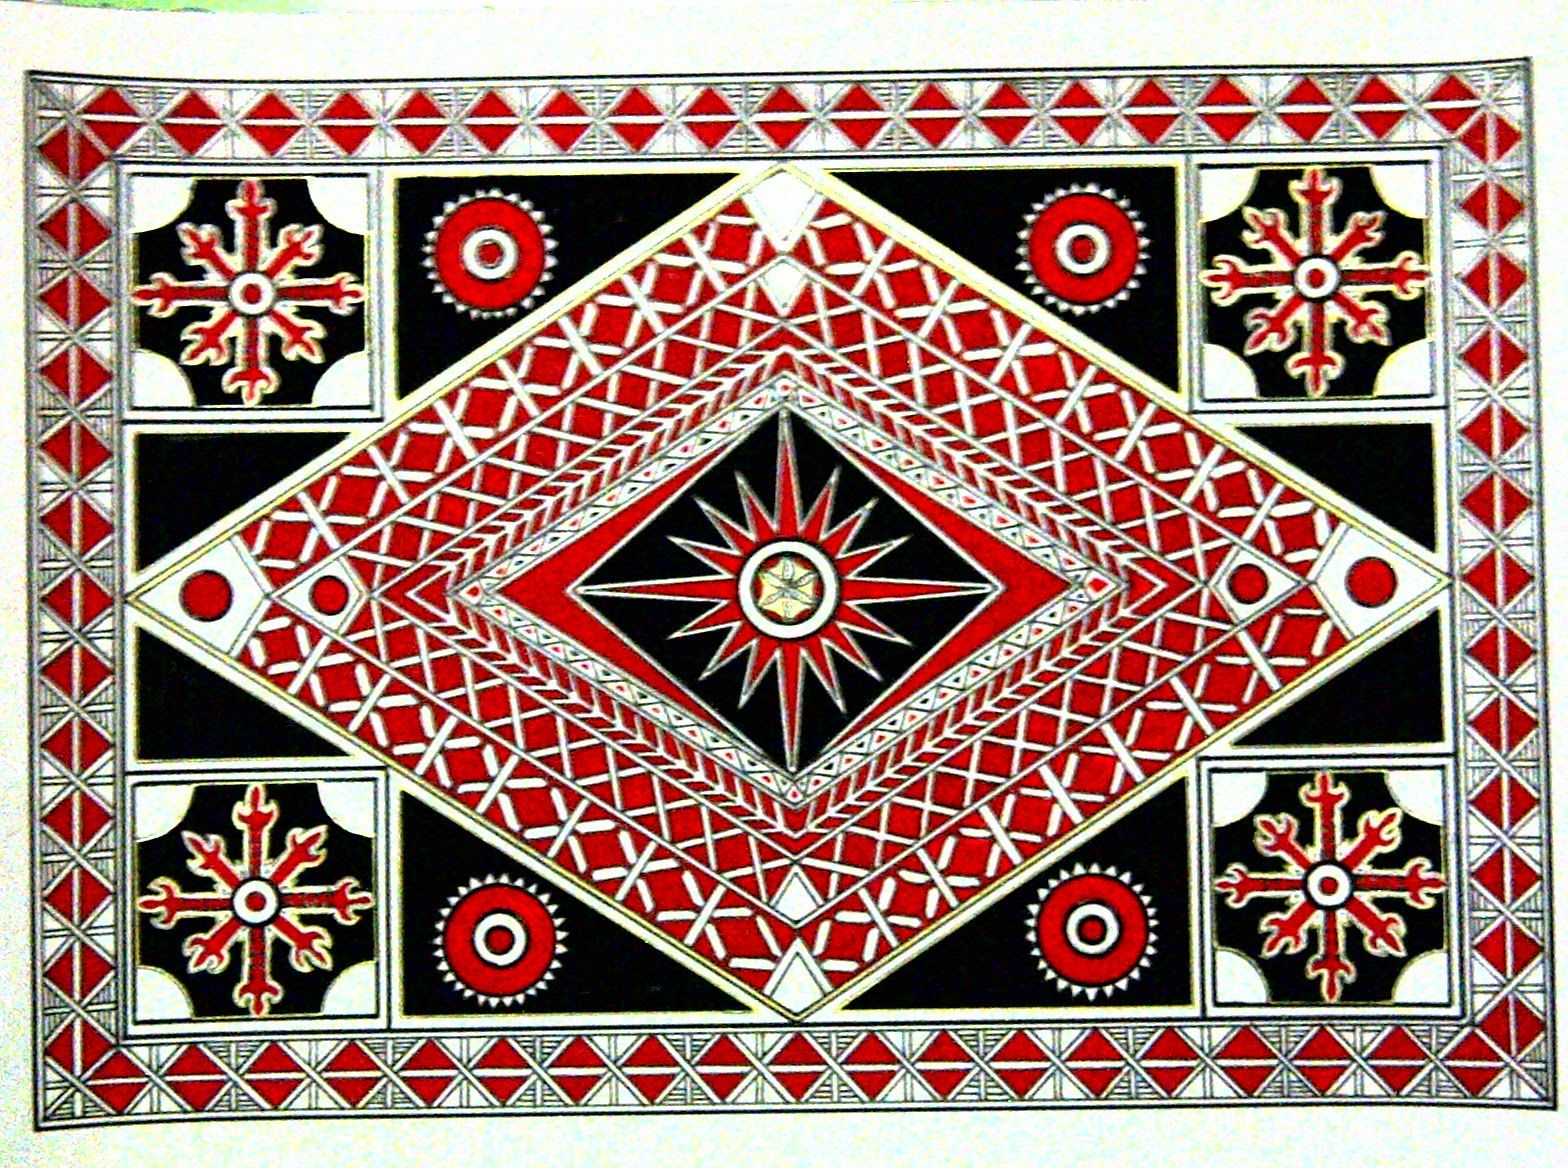 horas seni rupa ornamen tradisional di sumatera utara ornamen seni seni rupa ornamen tradisional di sumatera utara